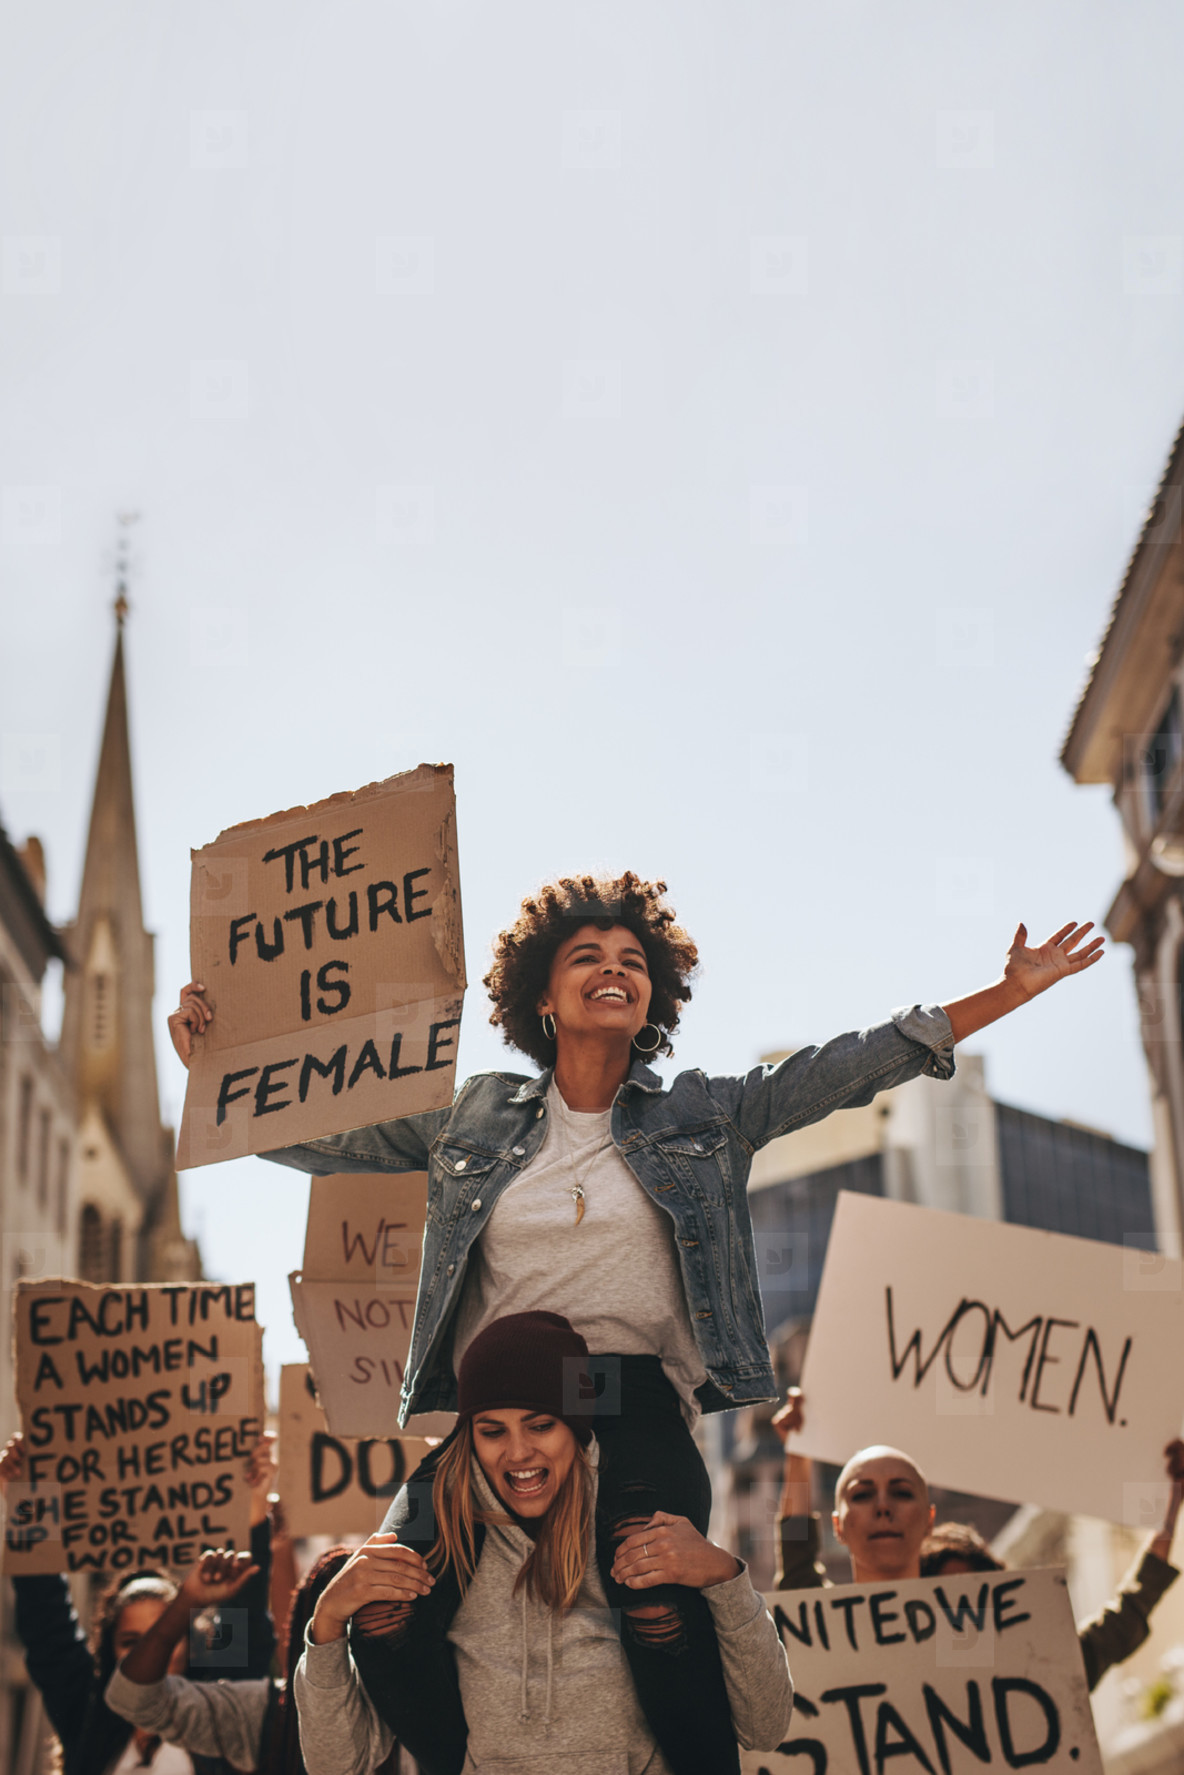 Female demonstrators enjoying the protest on road